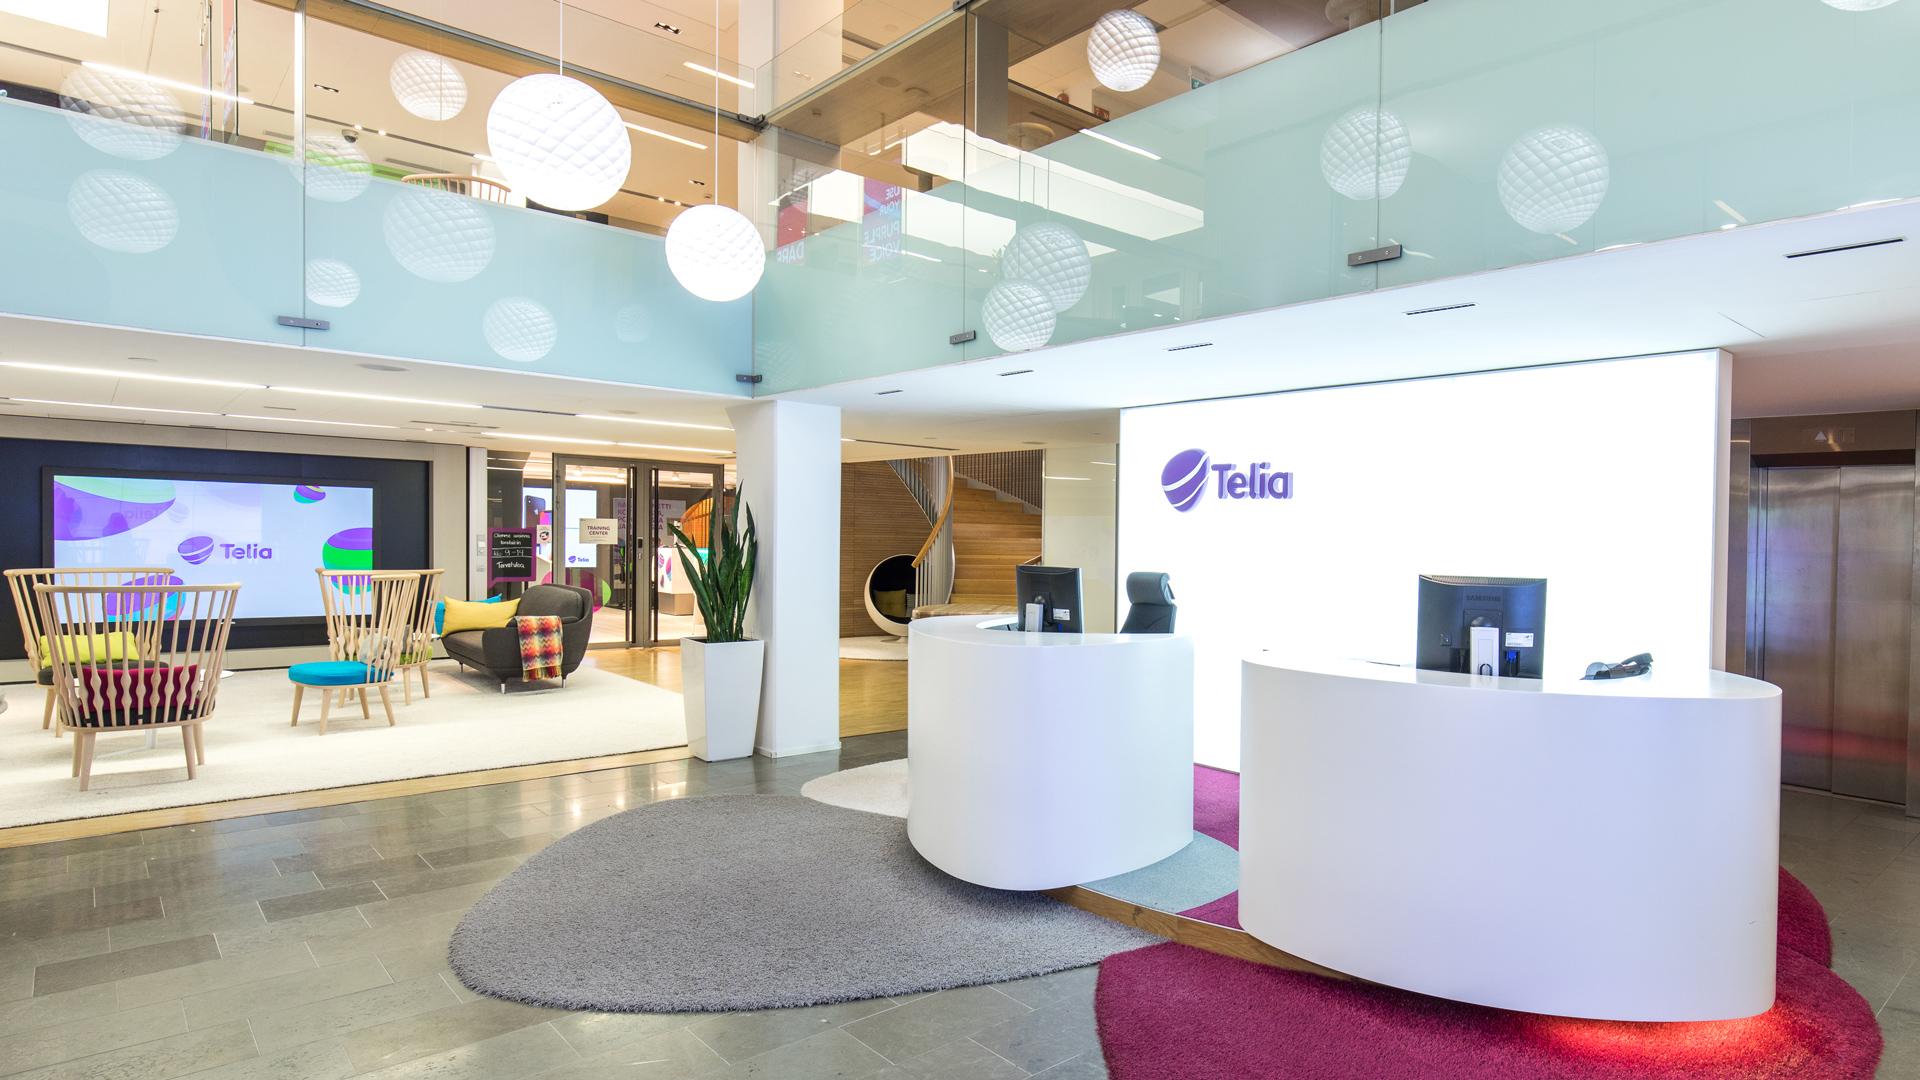 Telia-Finland-Headquarters-Teollisuuskatu-GI-Project-1